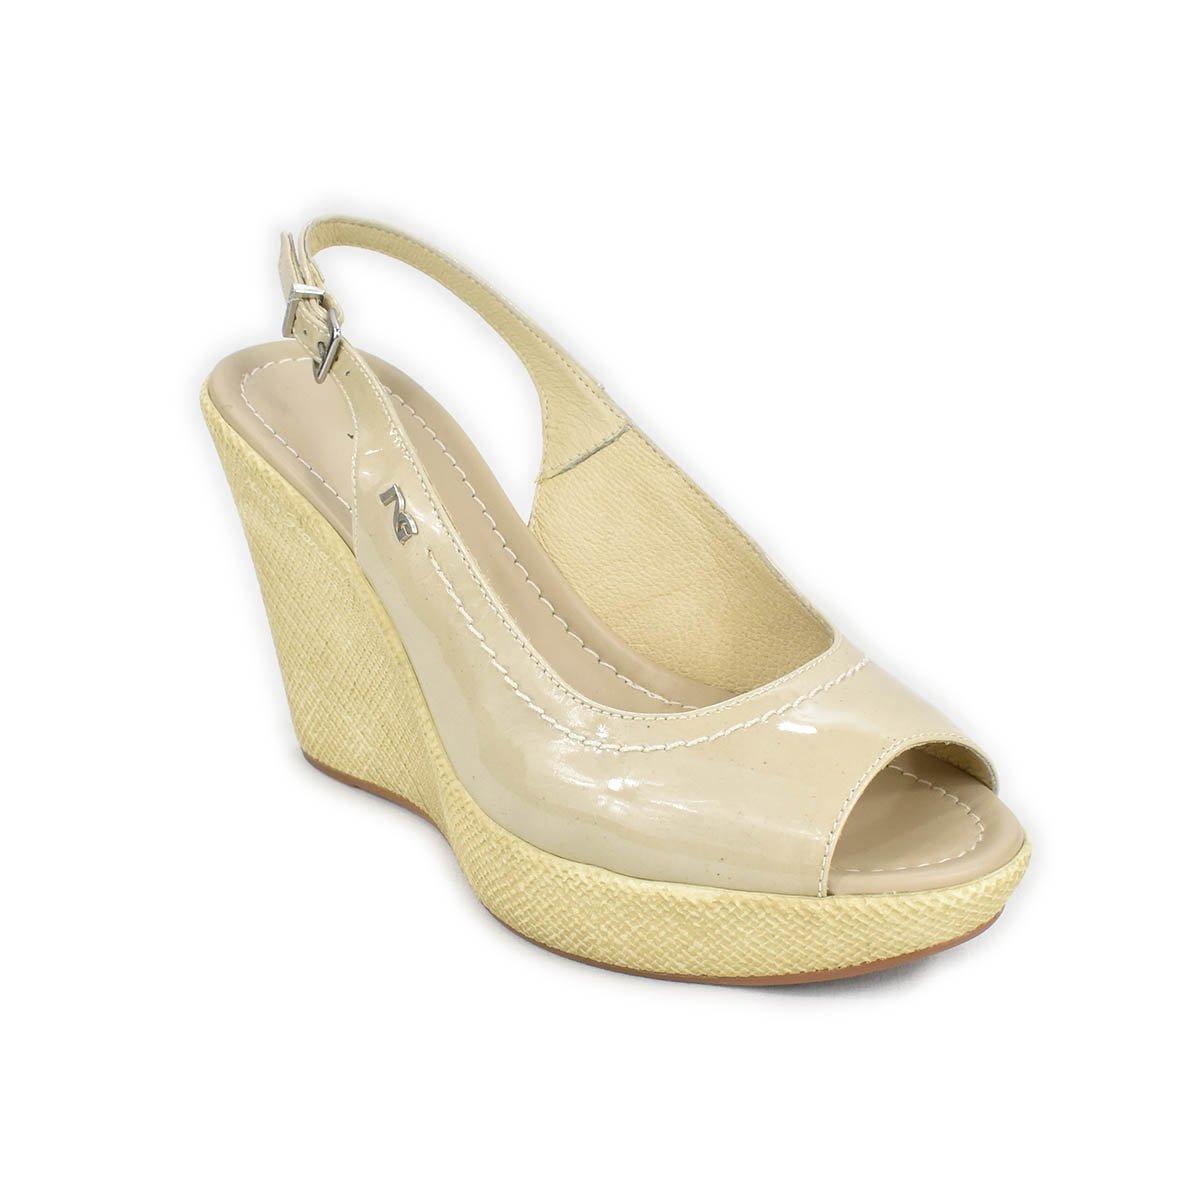 Sandali NeroGiardini beige